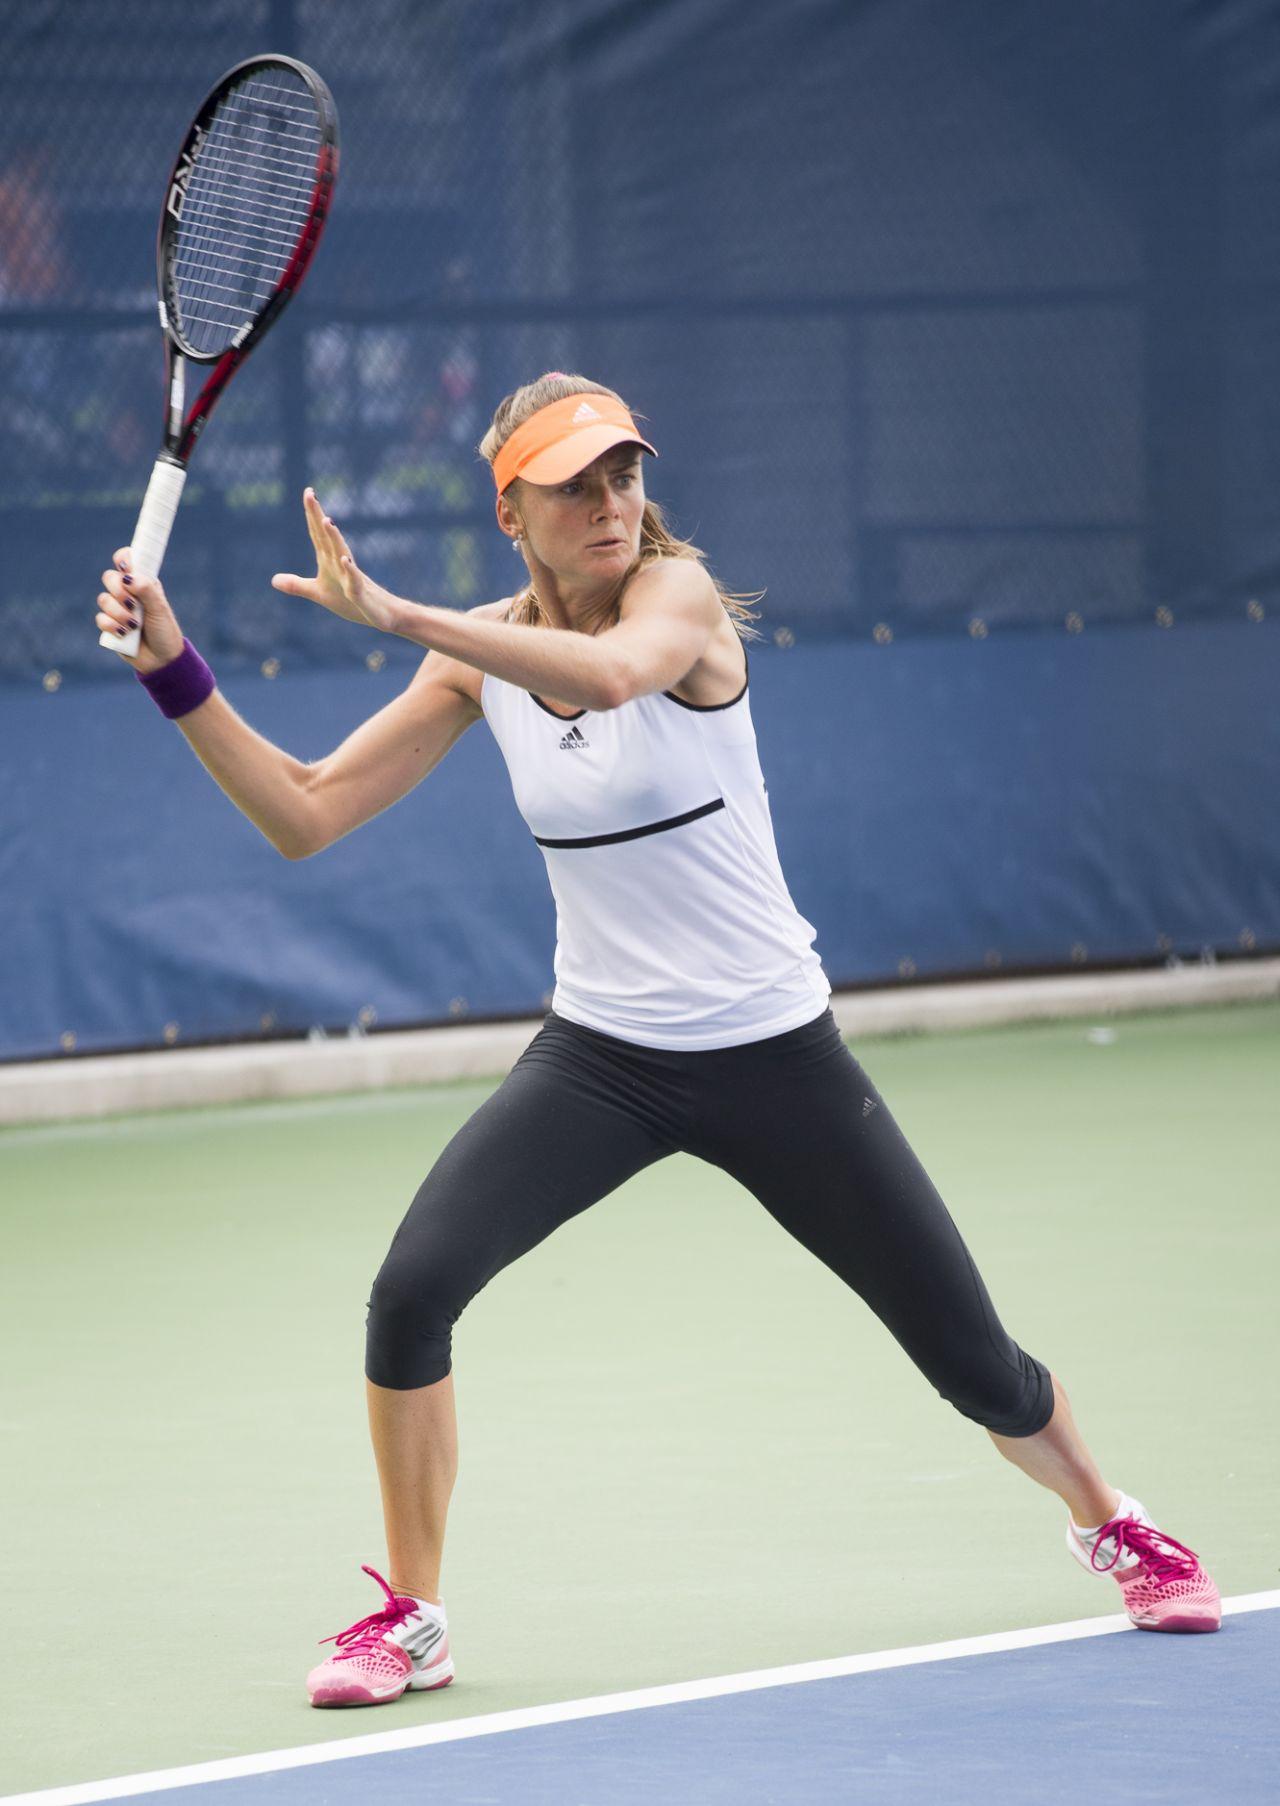 Daniela Hantuchova Practice at the 2014 US Open in New York City